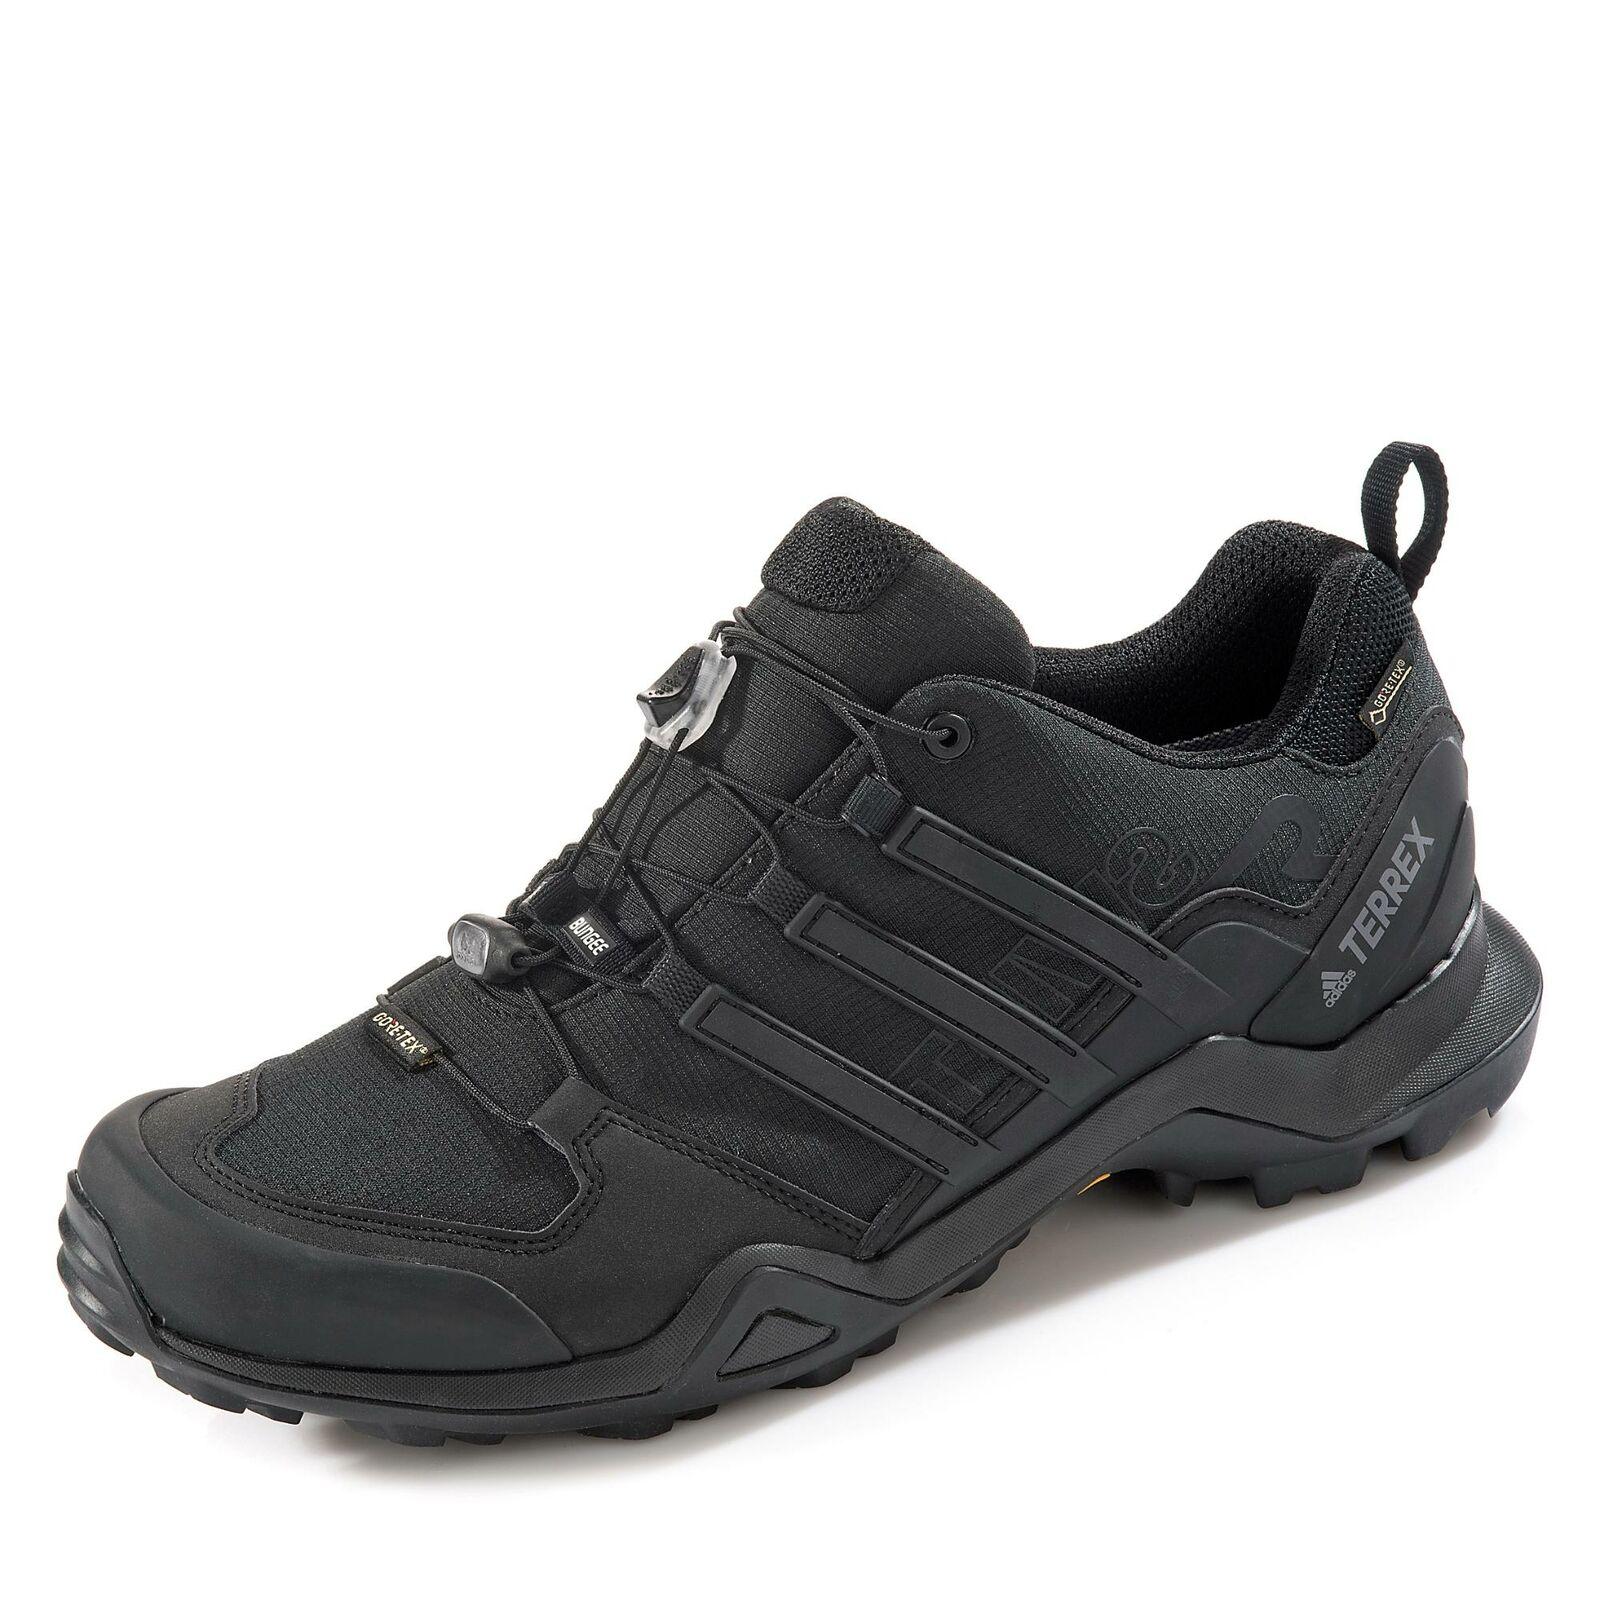 Adidas Terrex Swift R2 GORE-TEX Herren Outdoorschuh Turnschuh Schuhe Kunstleder